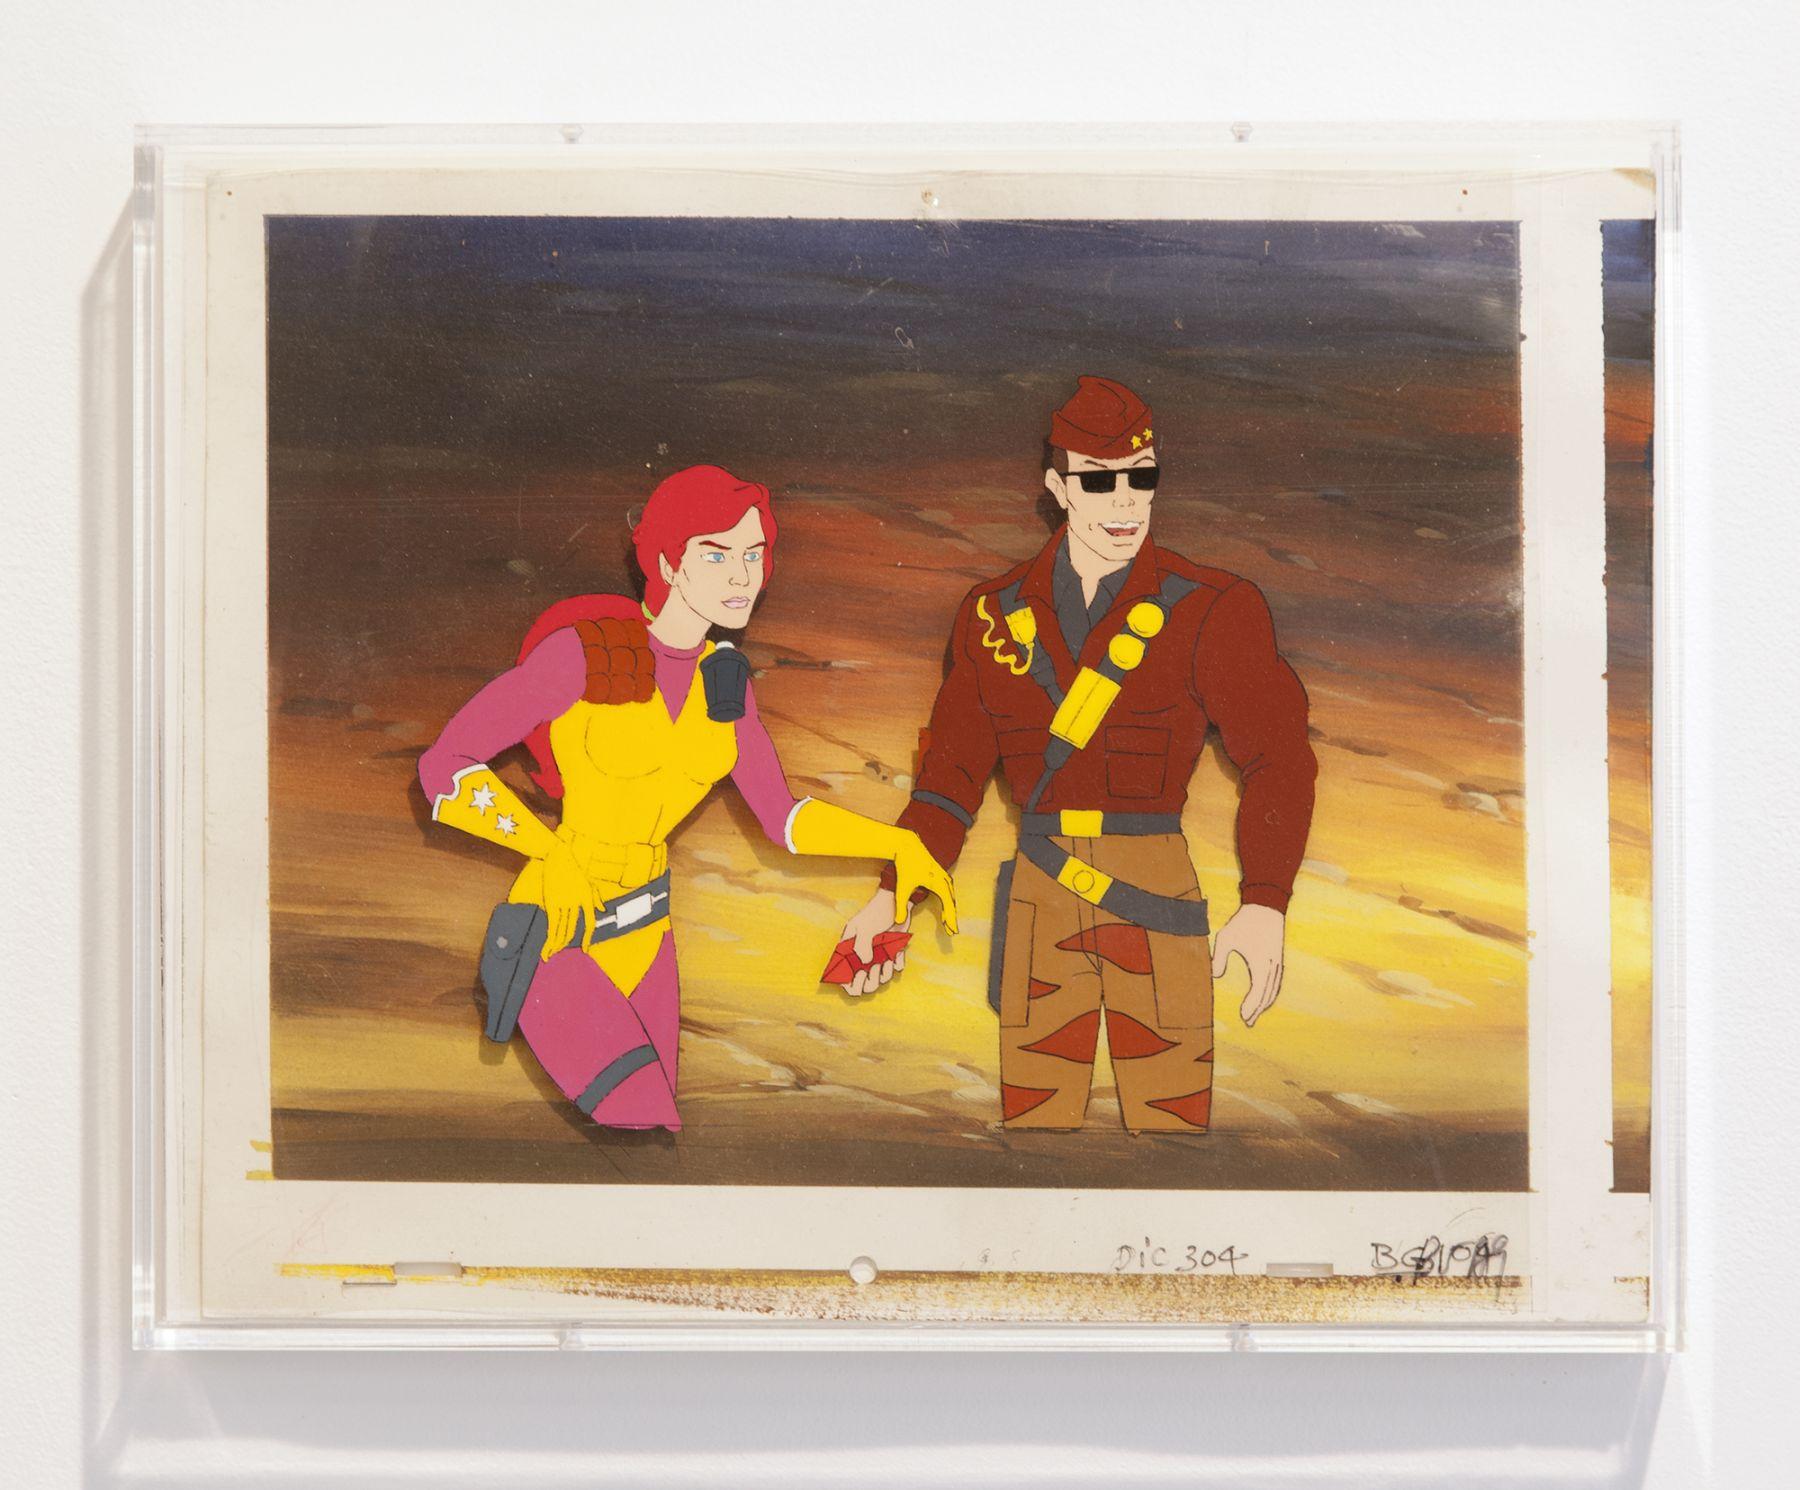 Lutz Bacher Space Cadets 2007 Plastic, Paint, Paper  Paper: 10 1/4 x 13 3/4 inches (26 x 34.9 cm) Frame: 11 1/16 x 14 1/4 inches (28.1 x 36.2 x 3.3 cm)